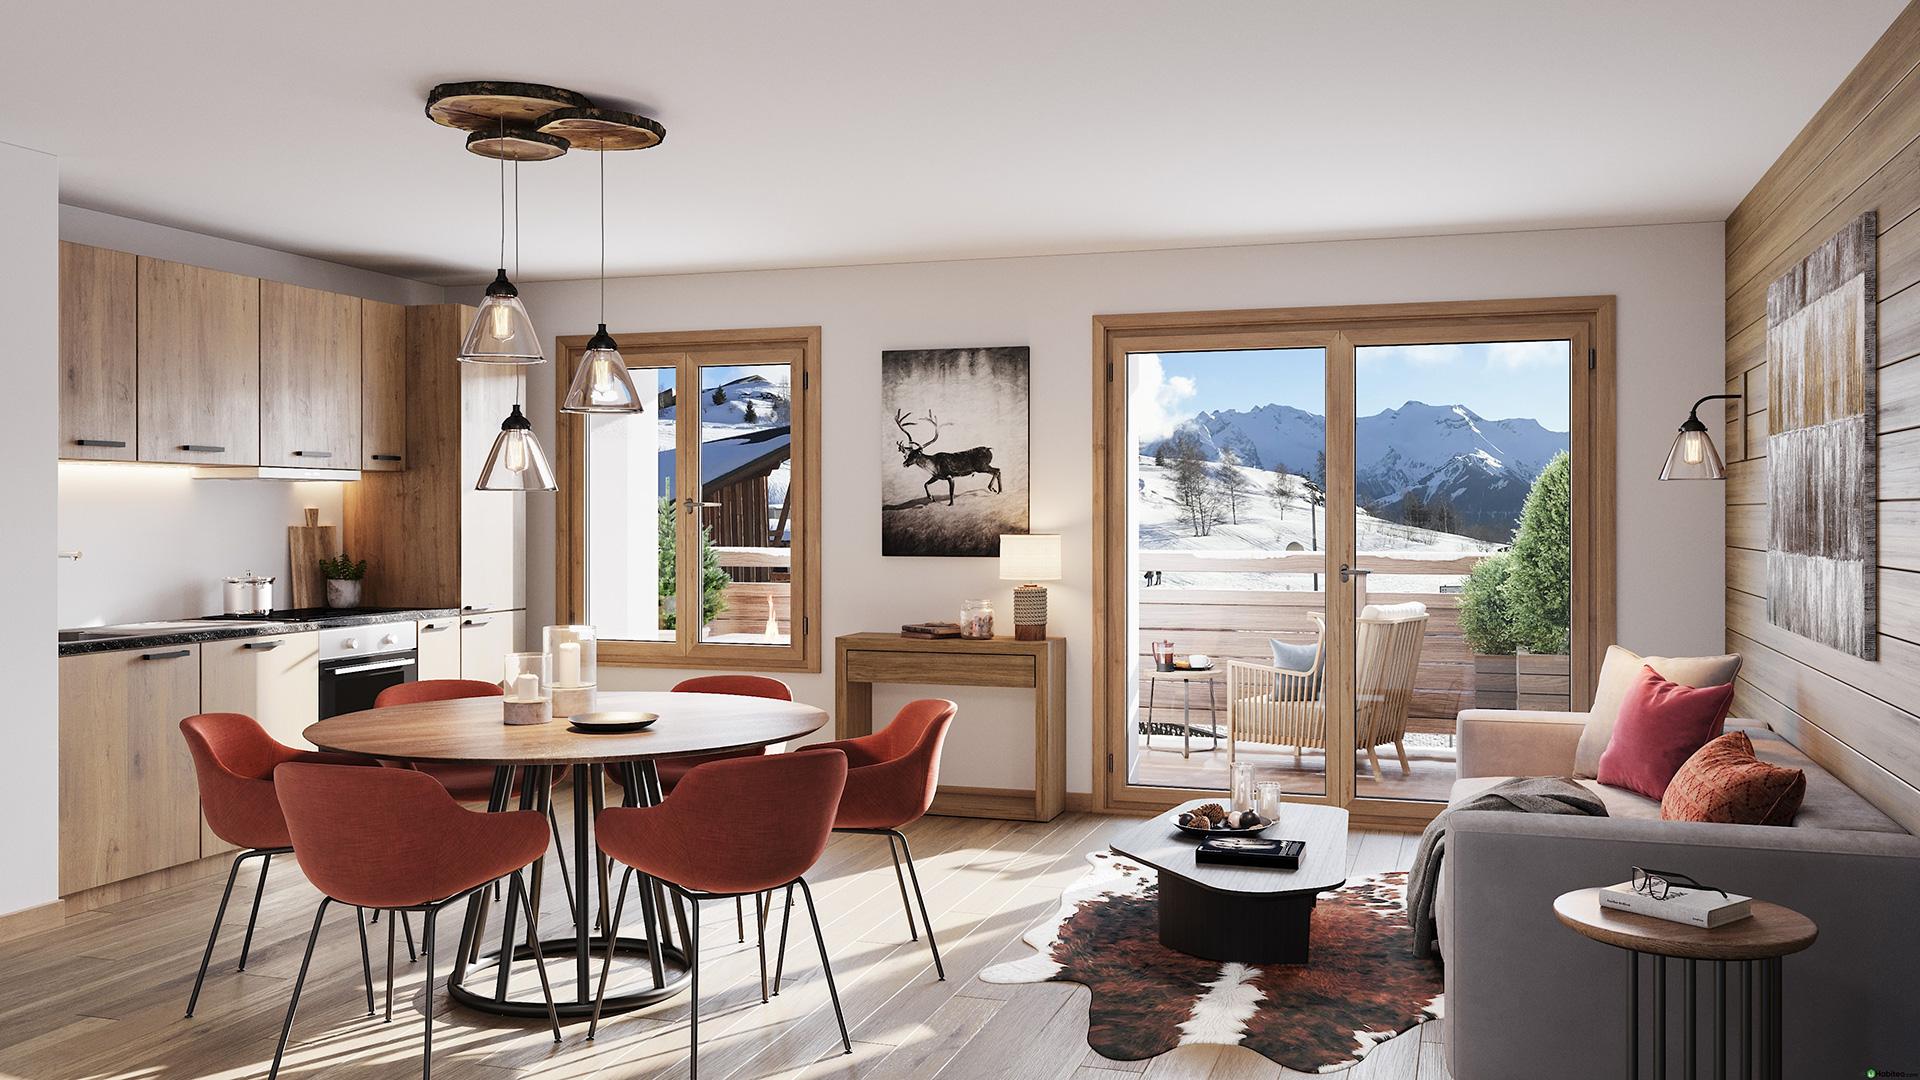 Le Quartz Apartments, France